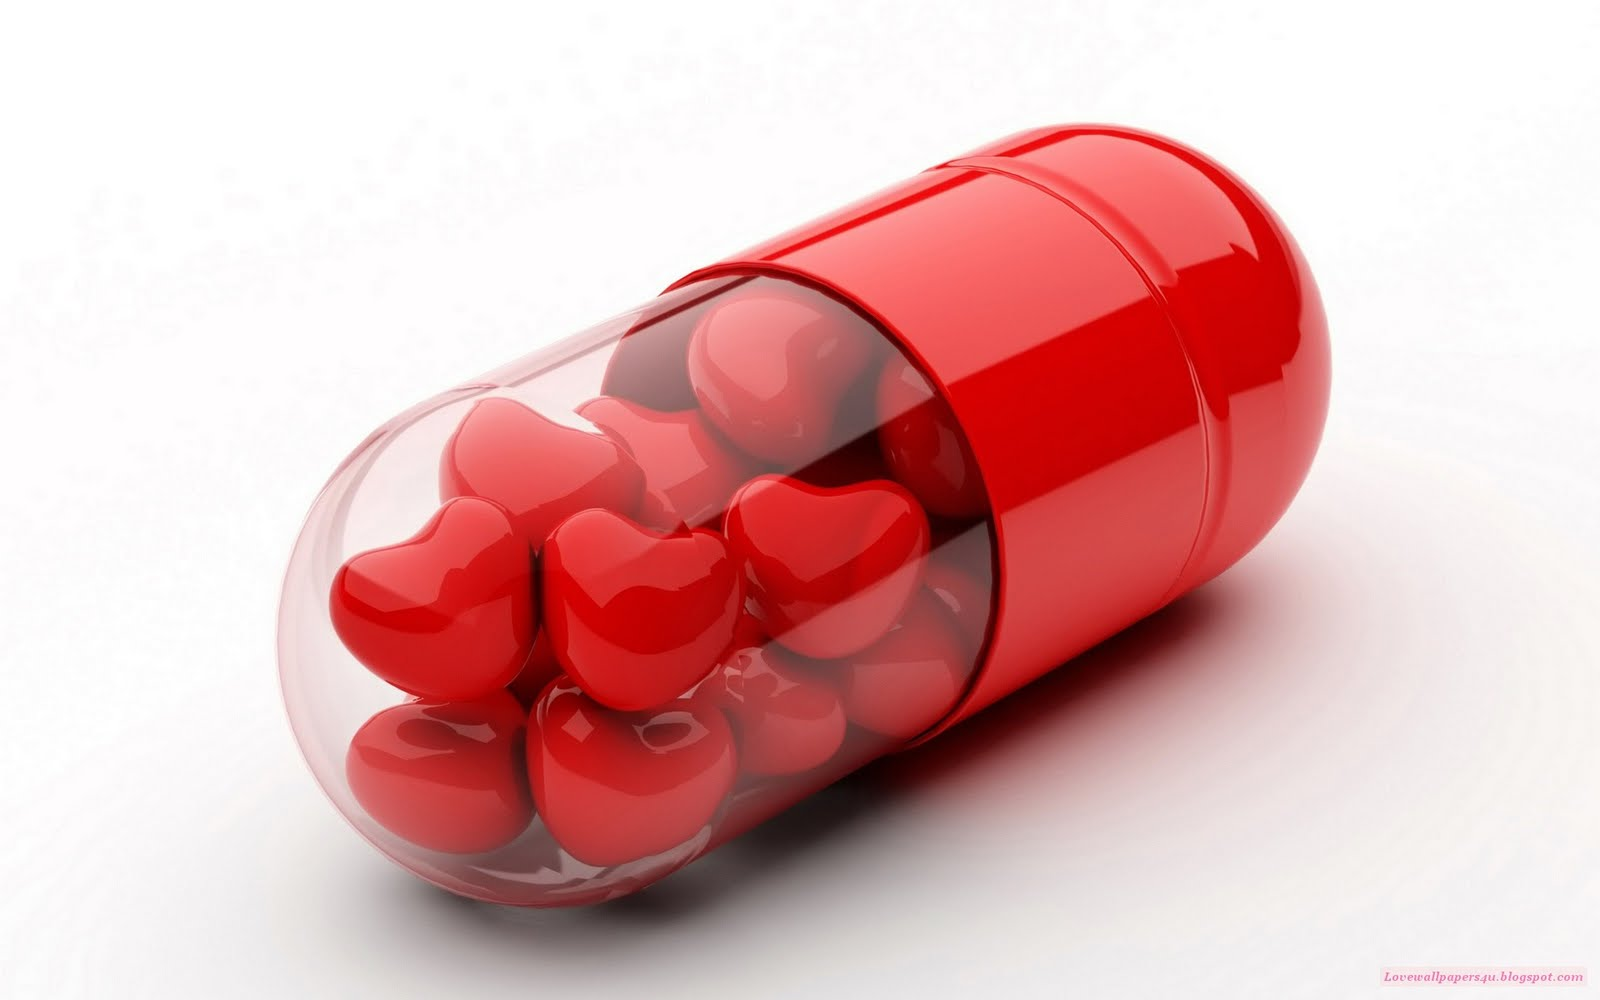 http://4.bp.blogspot.com/-BSPrb27NRbI/Tzwupa0s7JI/AAAAAAAABN0/Dmj7G-Zx8lg/s1600/capsule+of+love.jpg